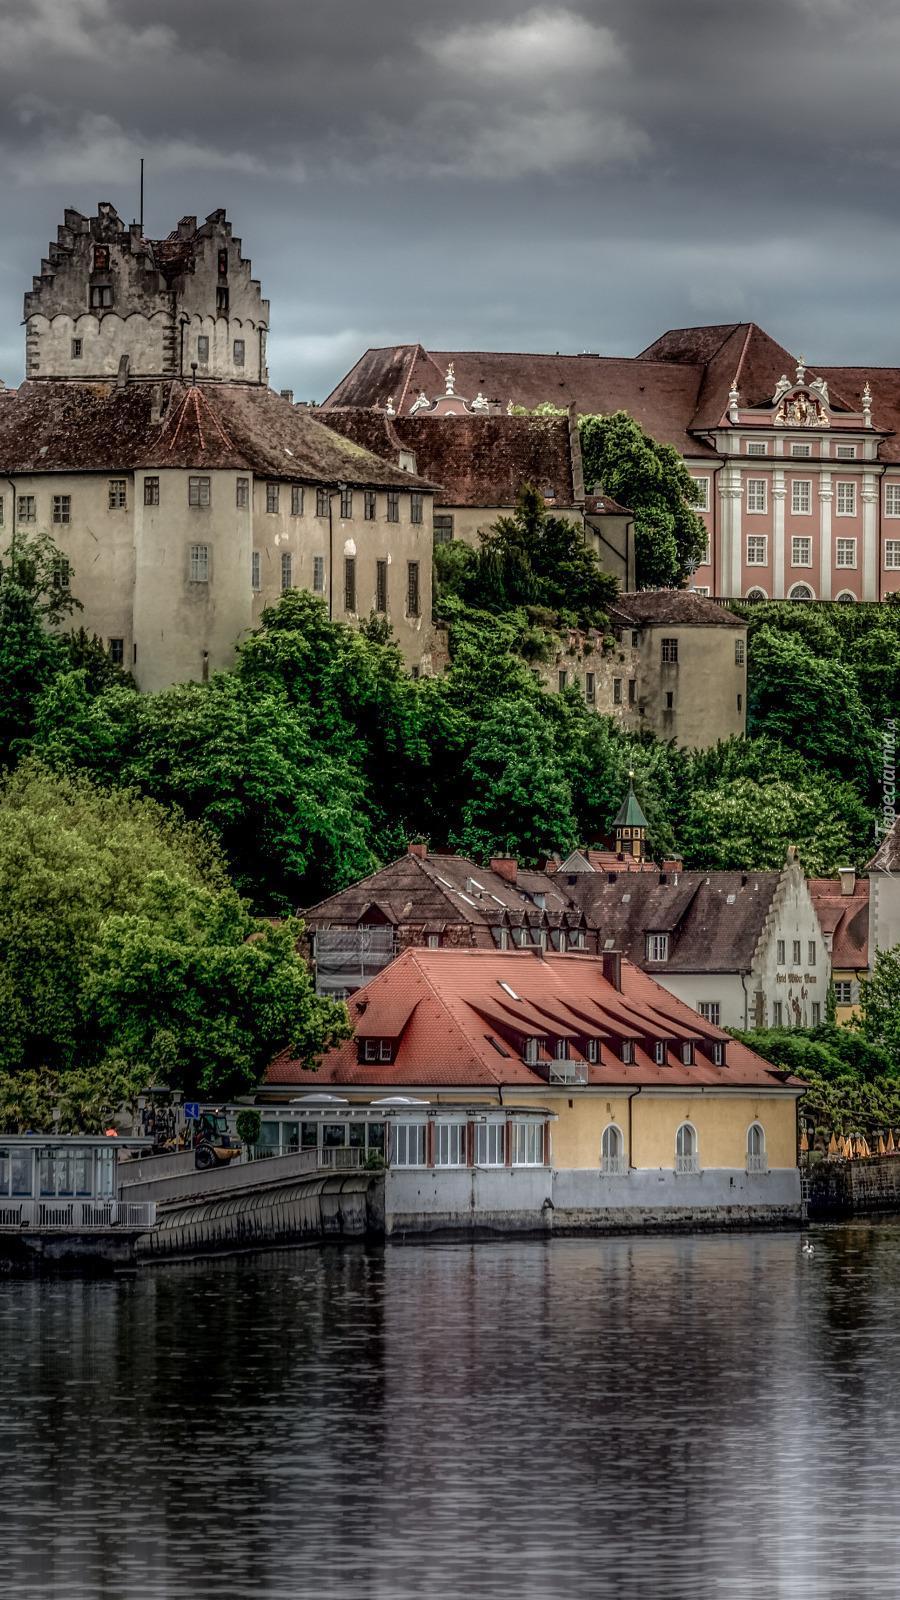 Mersburg nad jeziorem Bodeńskim